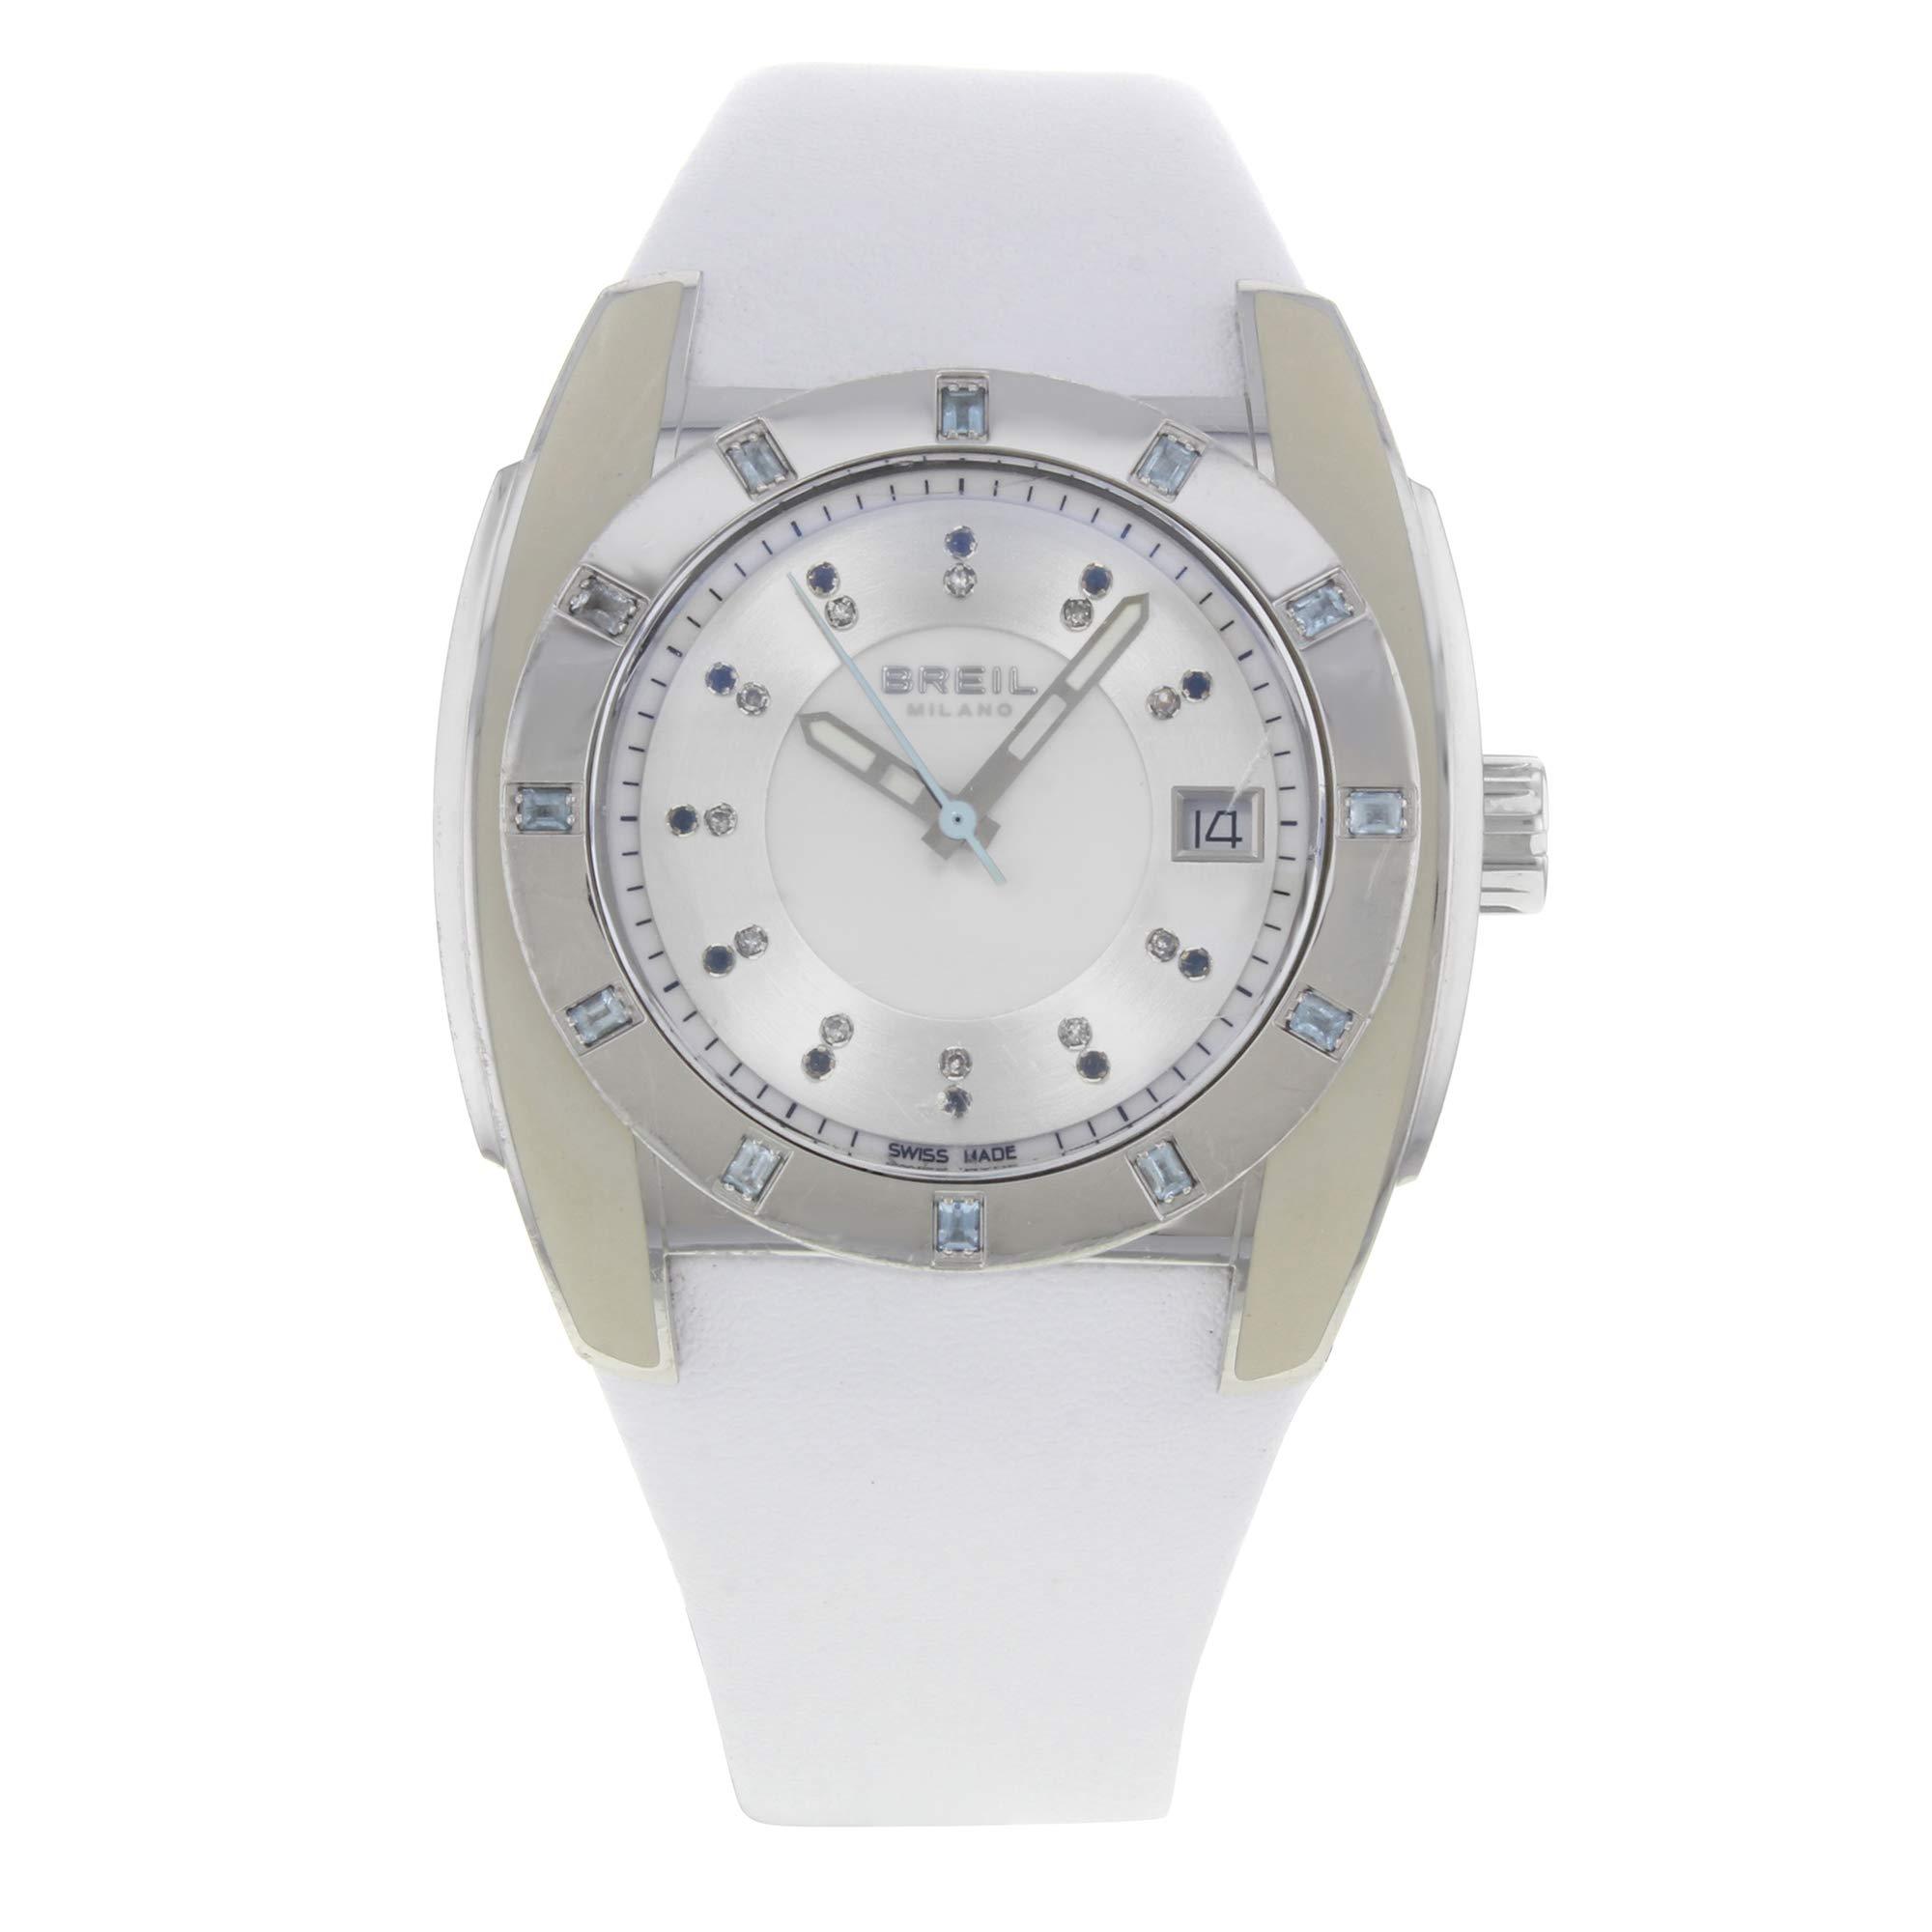 Breil Aquamarine Quartz Female Watch BW0520 (Certified Pre-Owned) by Breil